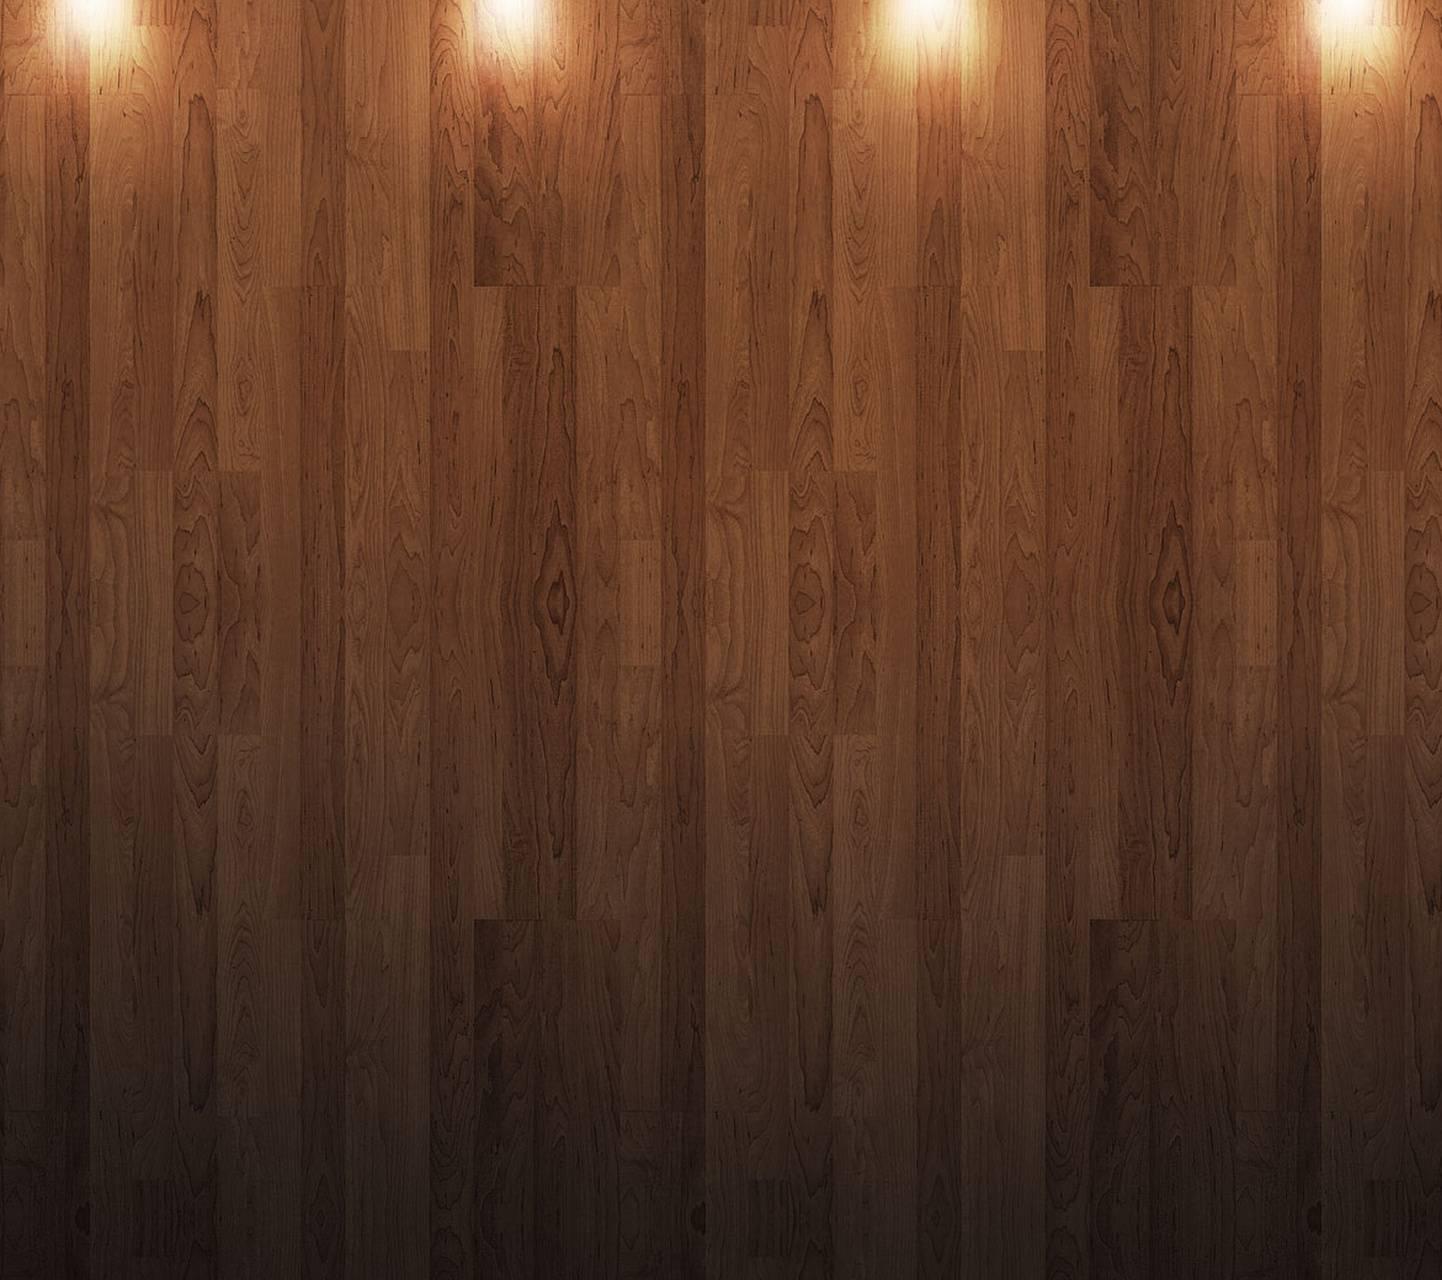 Wood Pattern